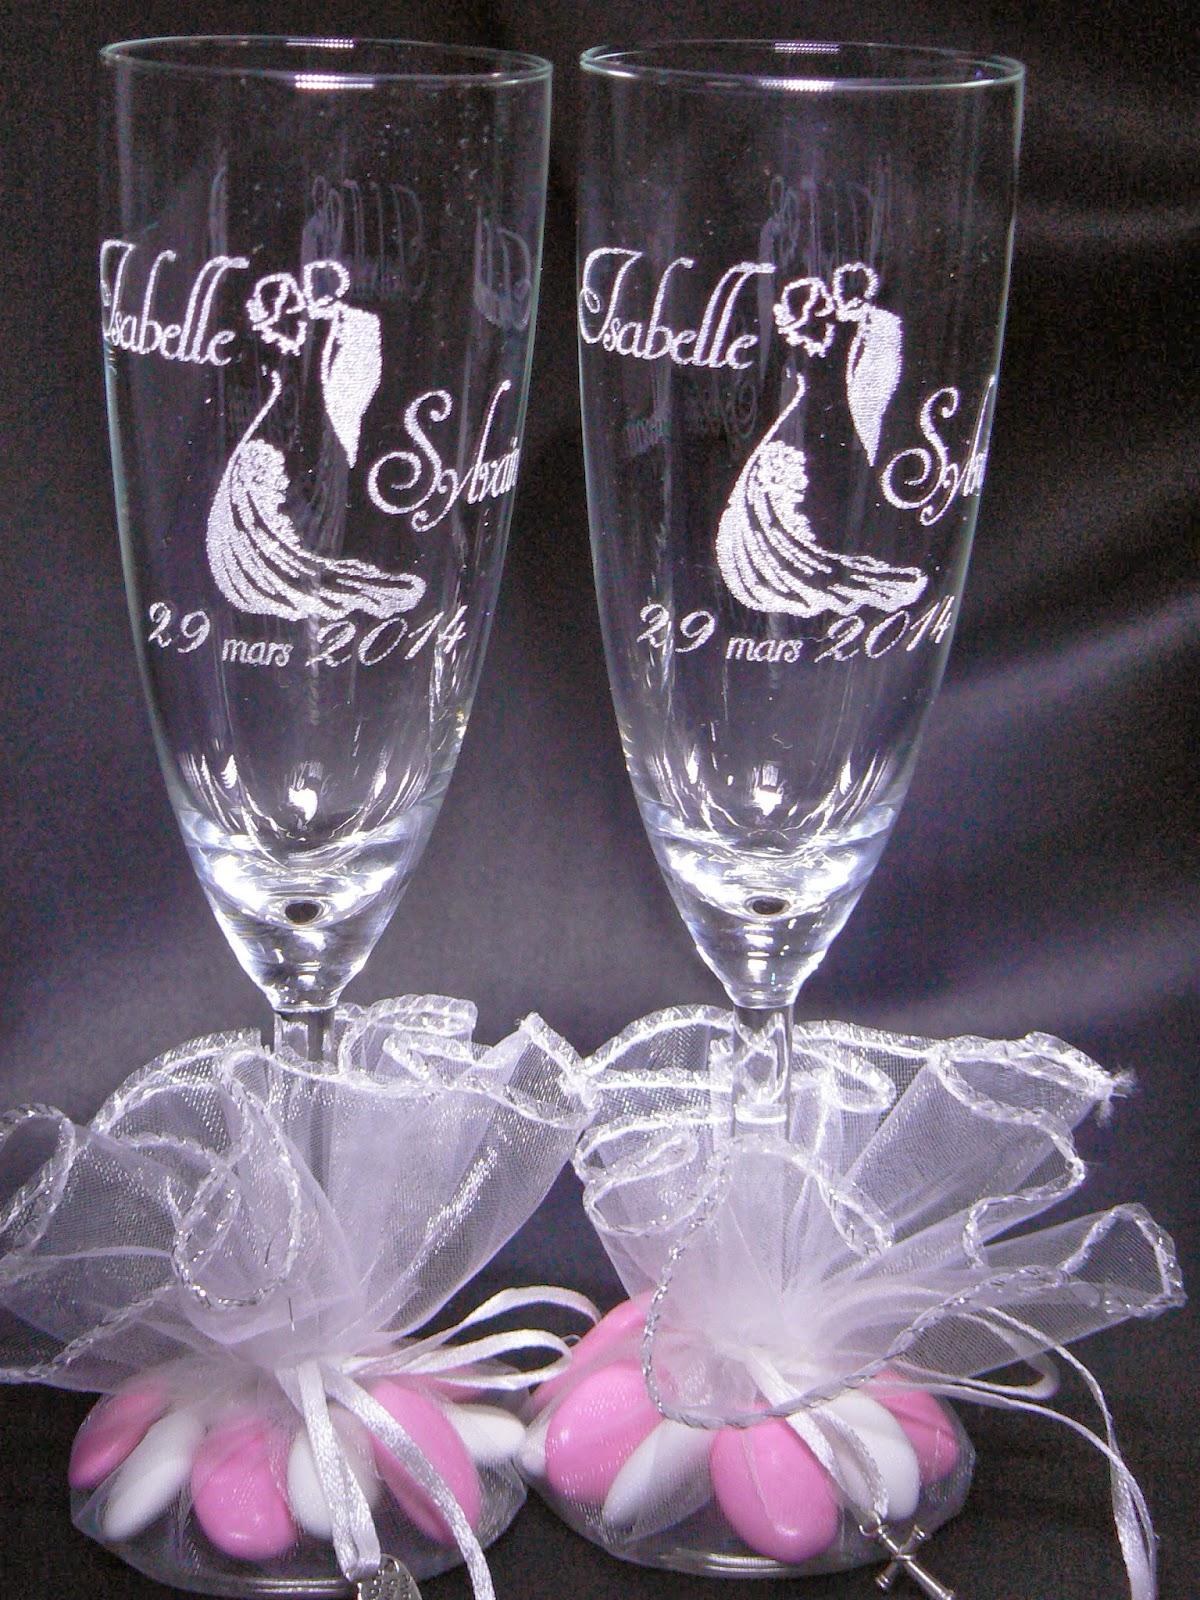 gravure verre mariage cadeau invite contenant drages original personnalis - Drag Mariage